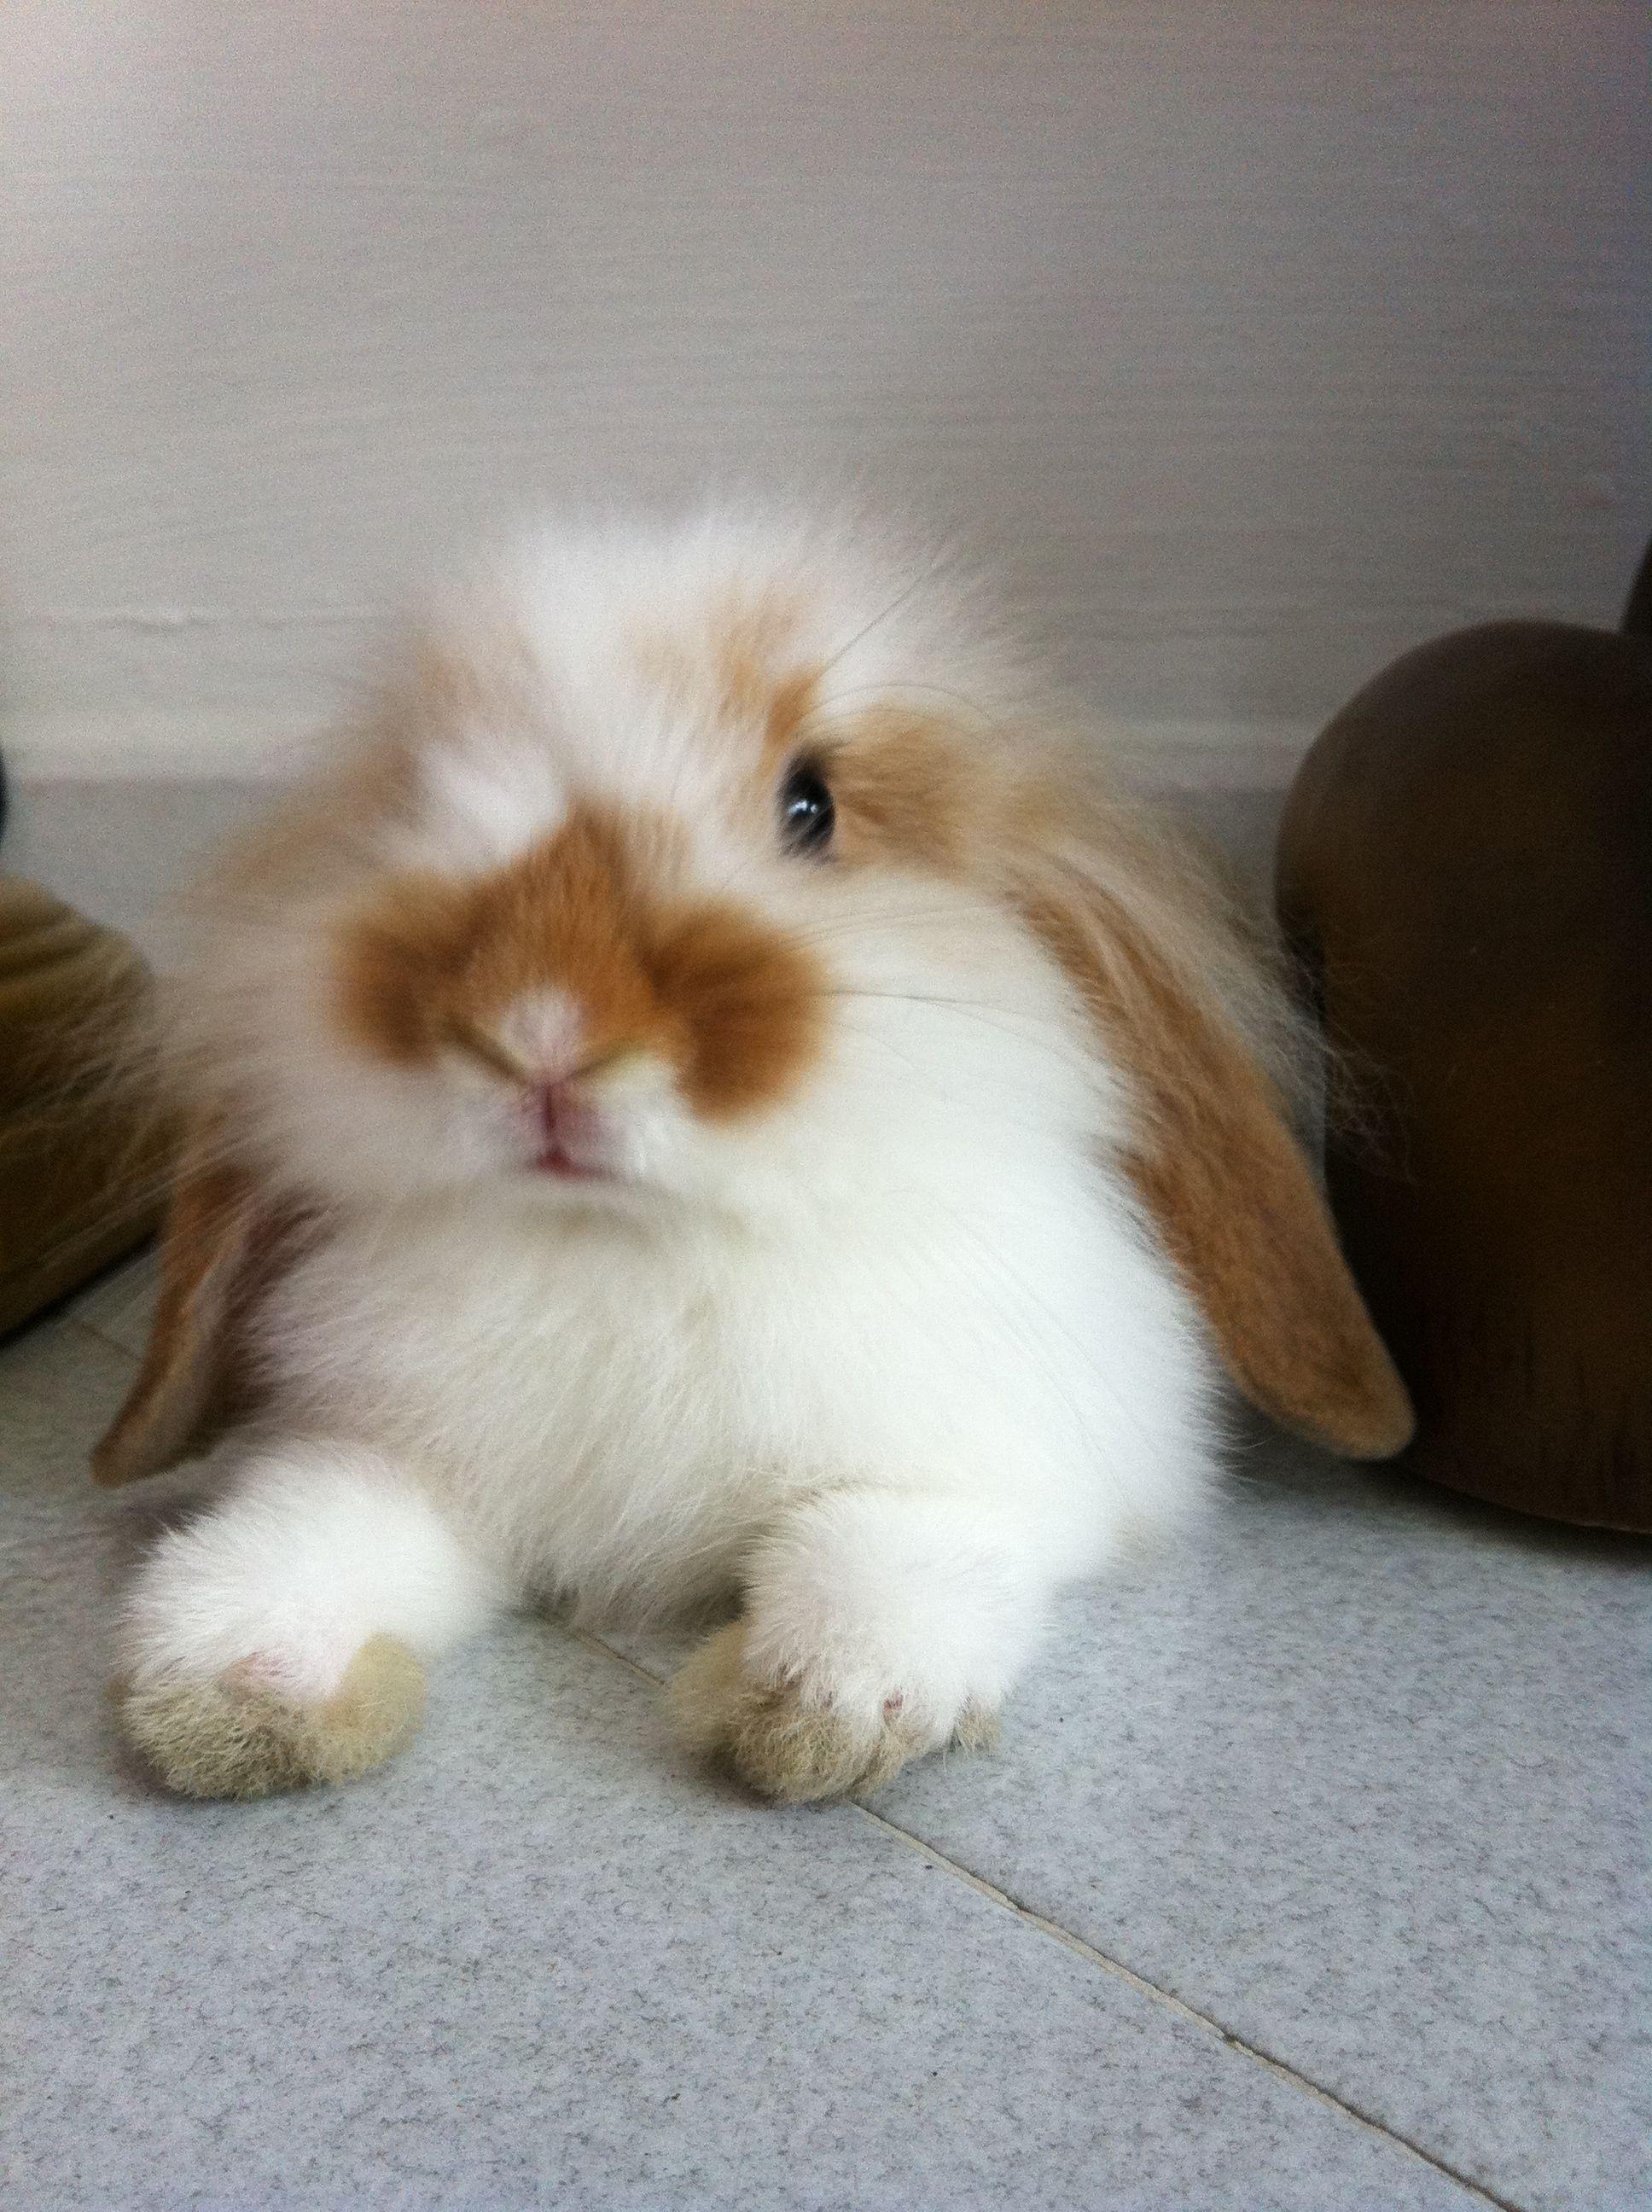 beautiful fluffy floppy bunny